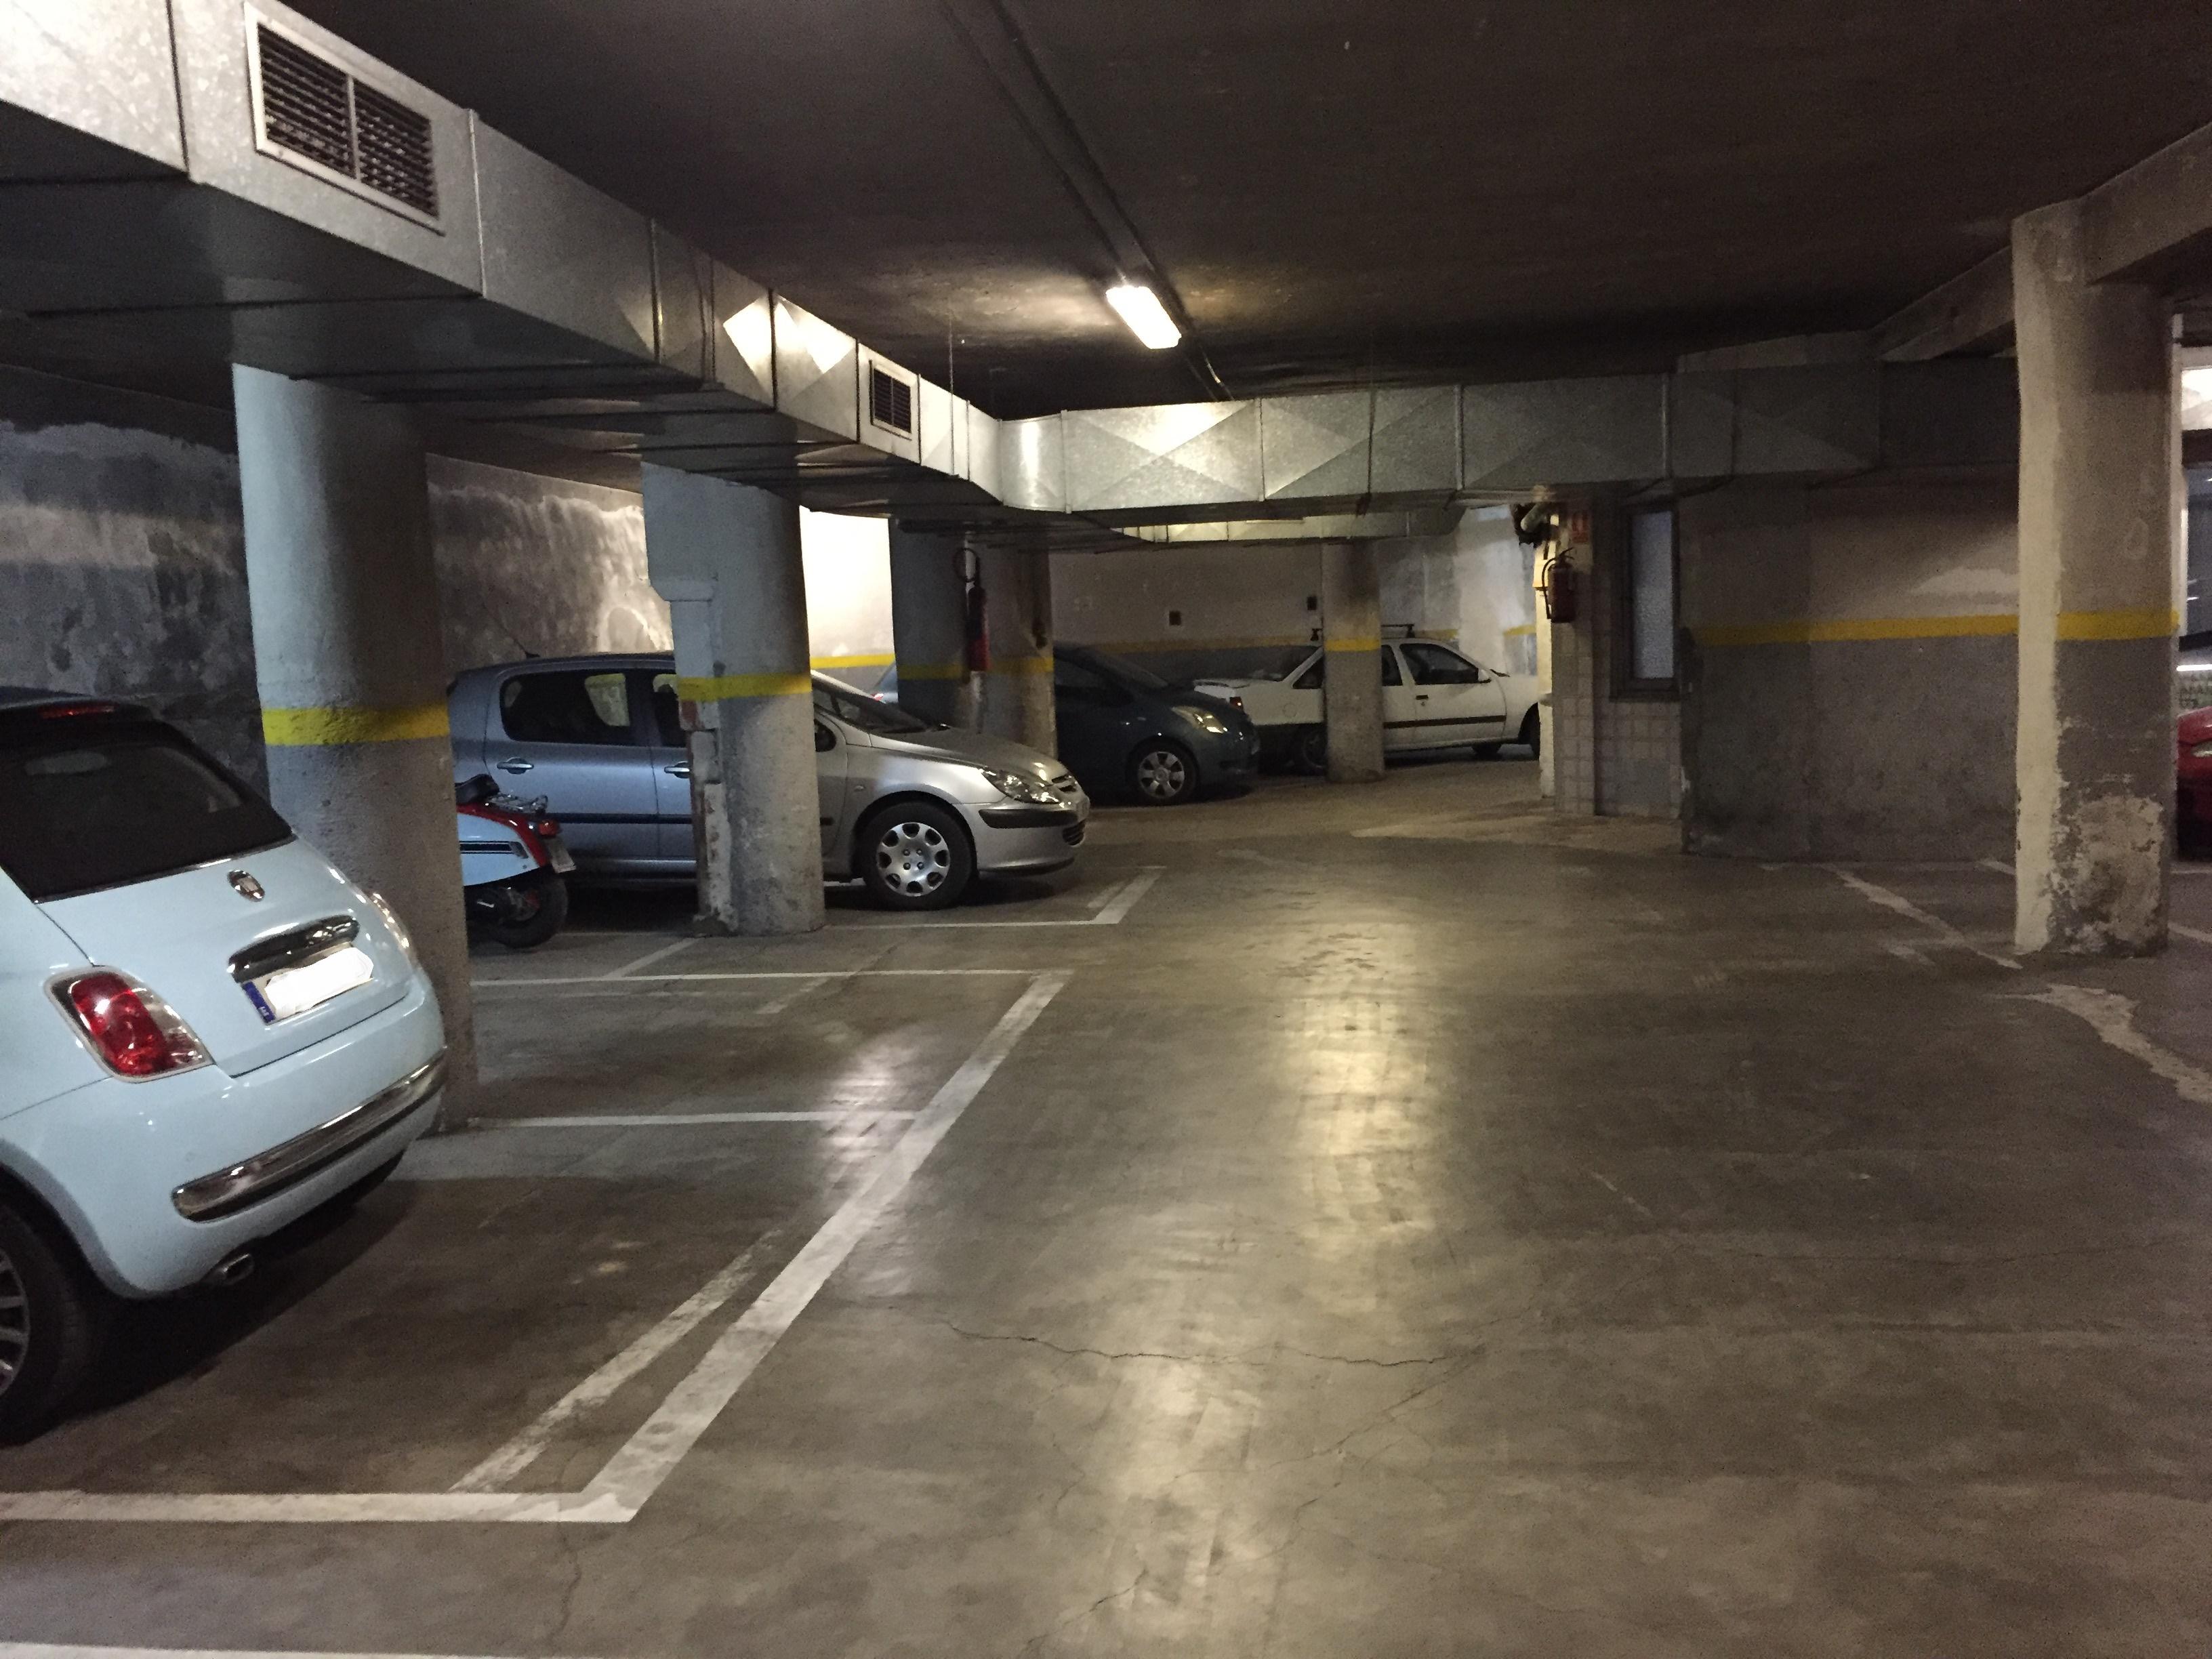 Garaje completo junto plaza espa a madrid - Garaje de coches ...